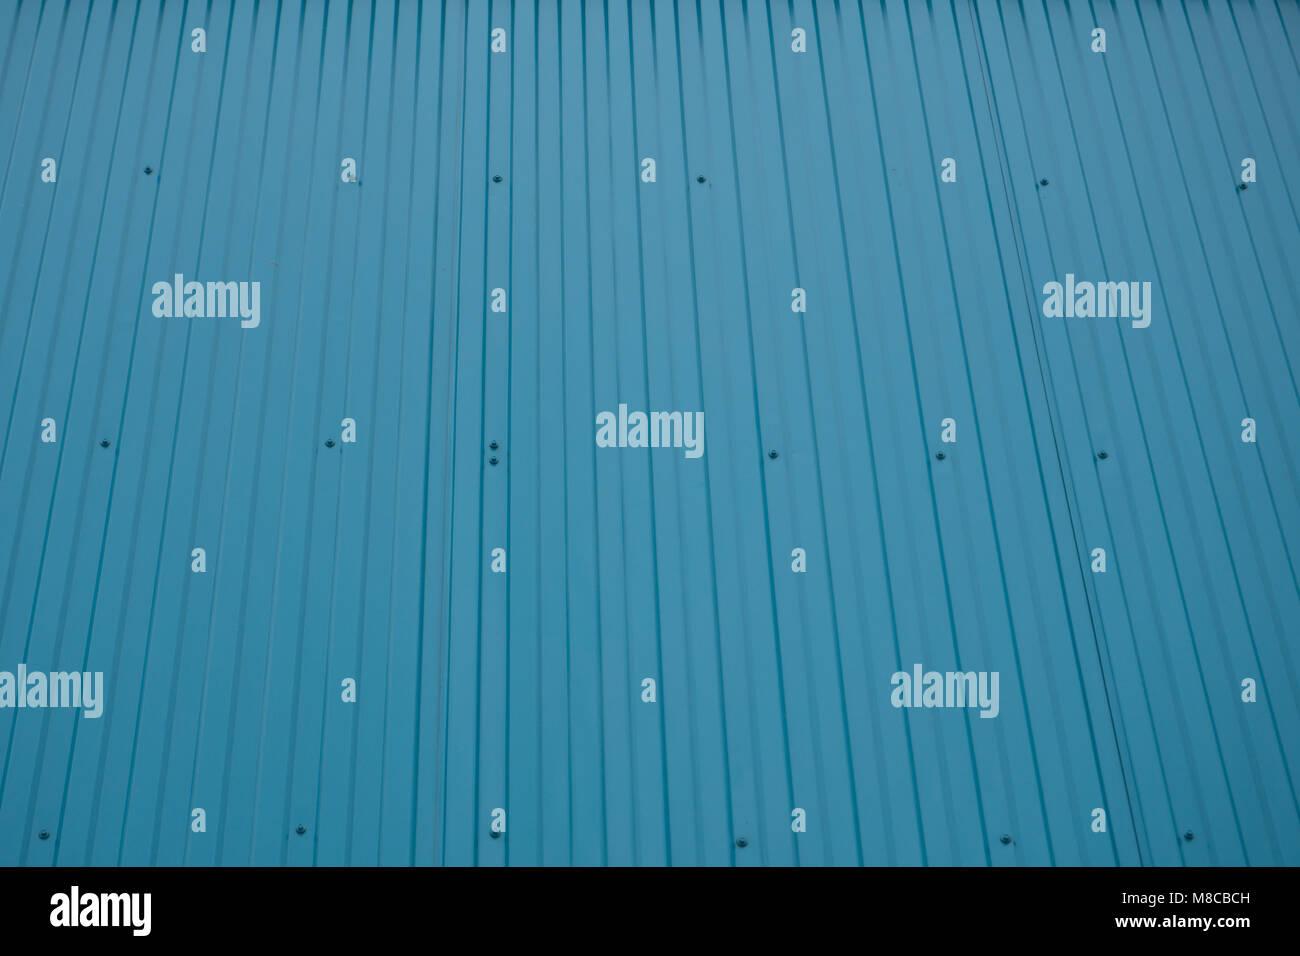 Blu di contenitore di spedizione anteriore parete scanalati dritti